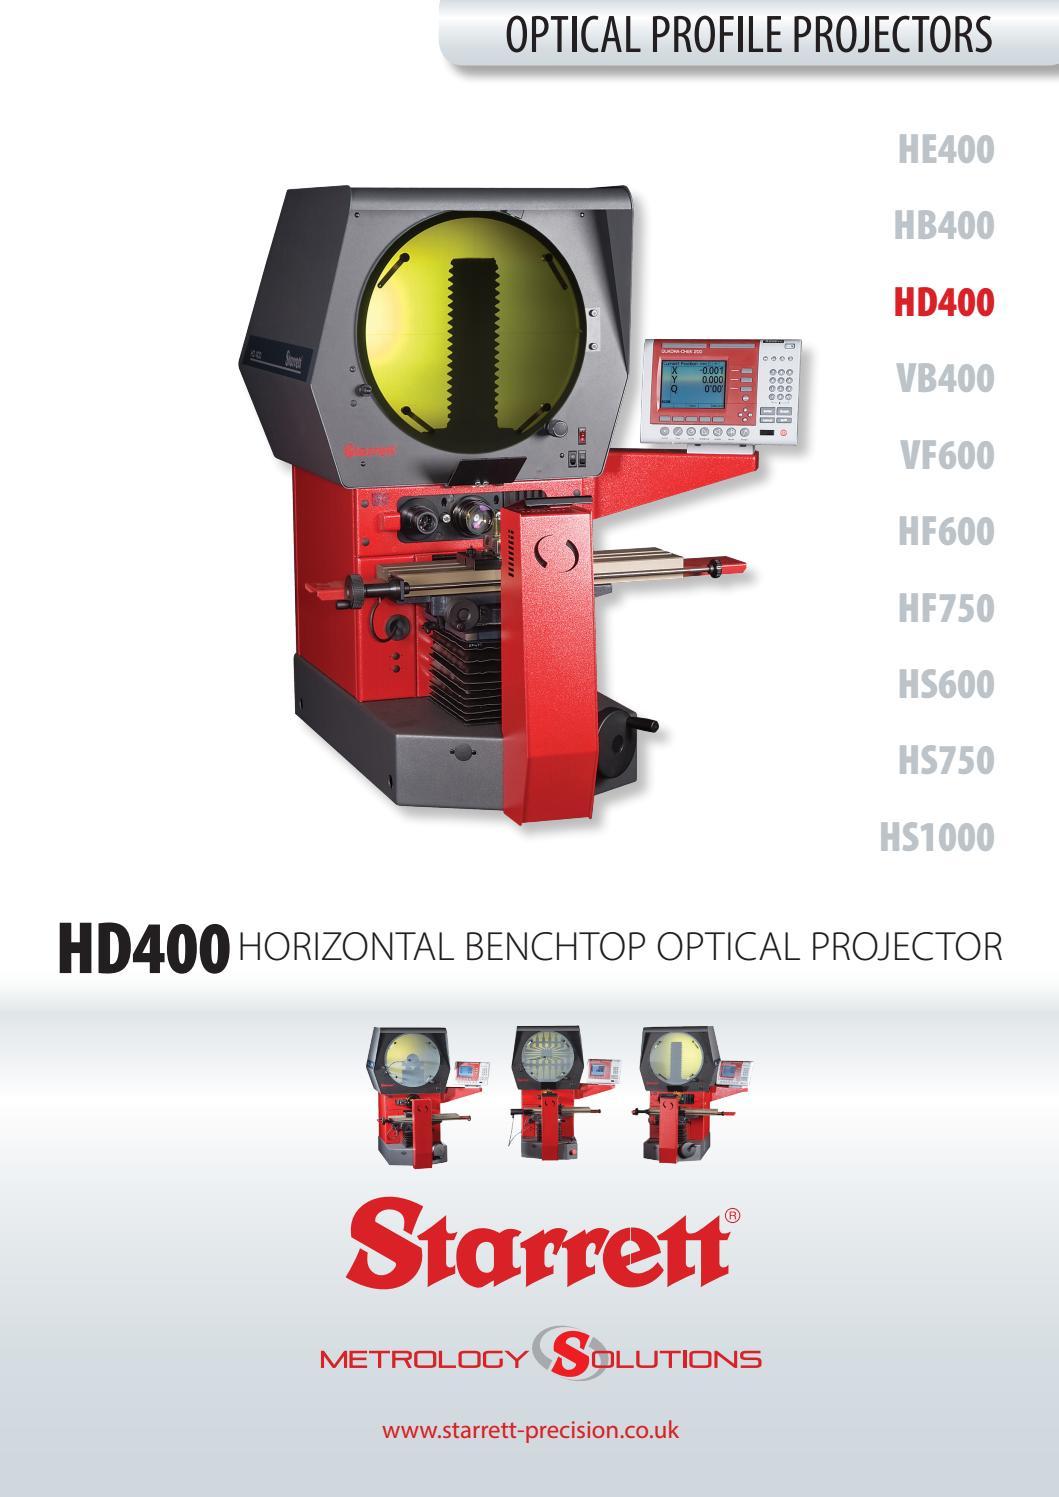 Starrett Hd400 Horizontal Benchtop Optical Profile